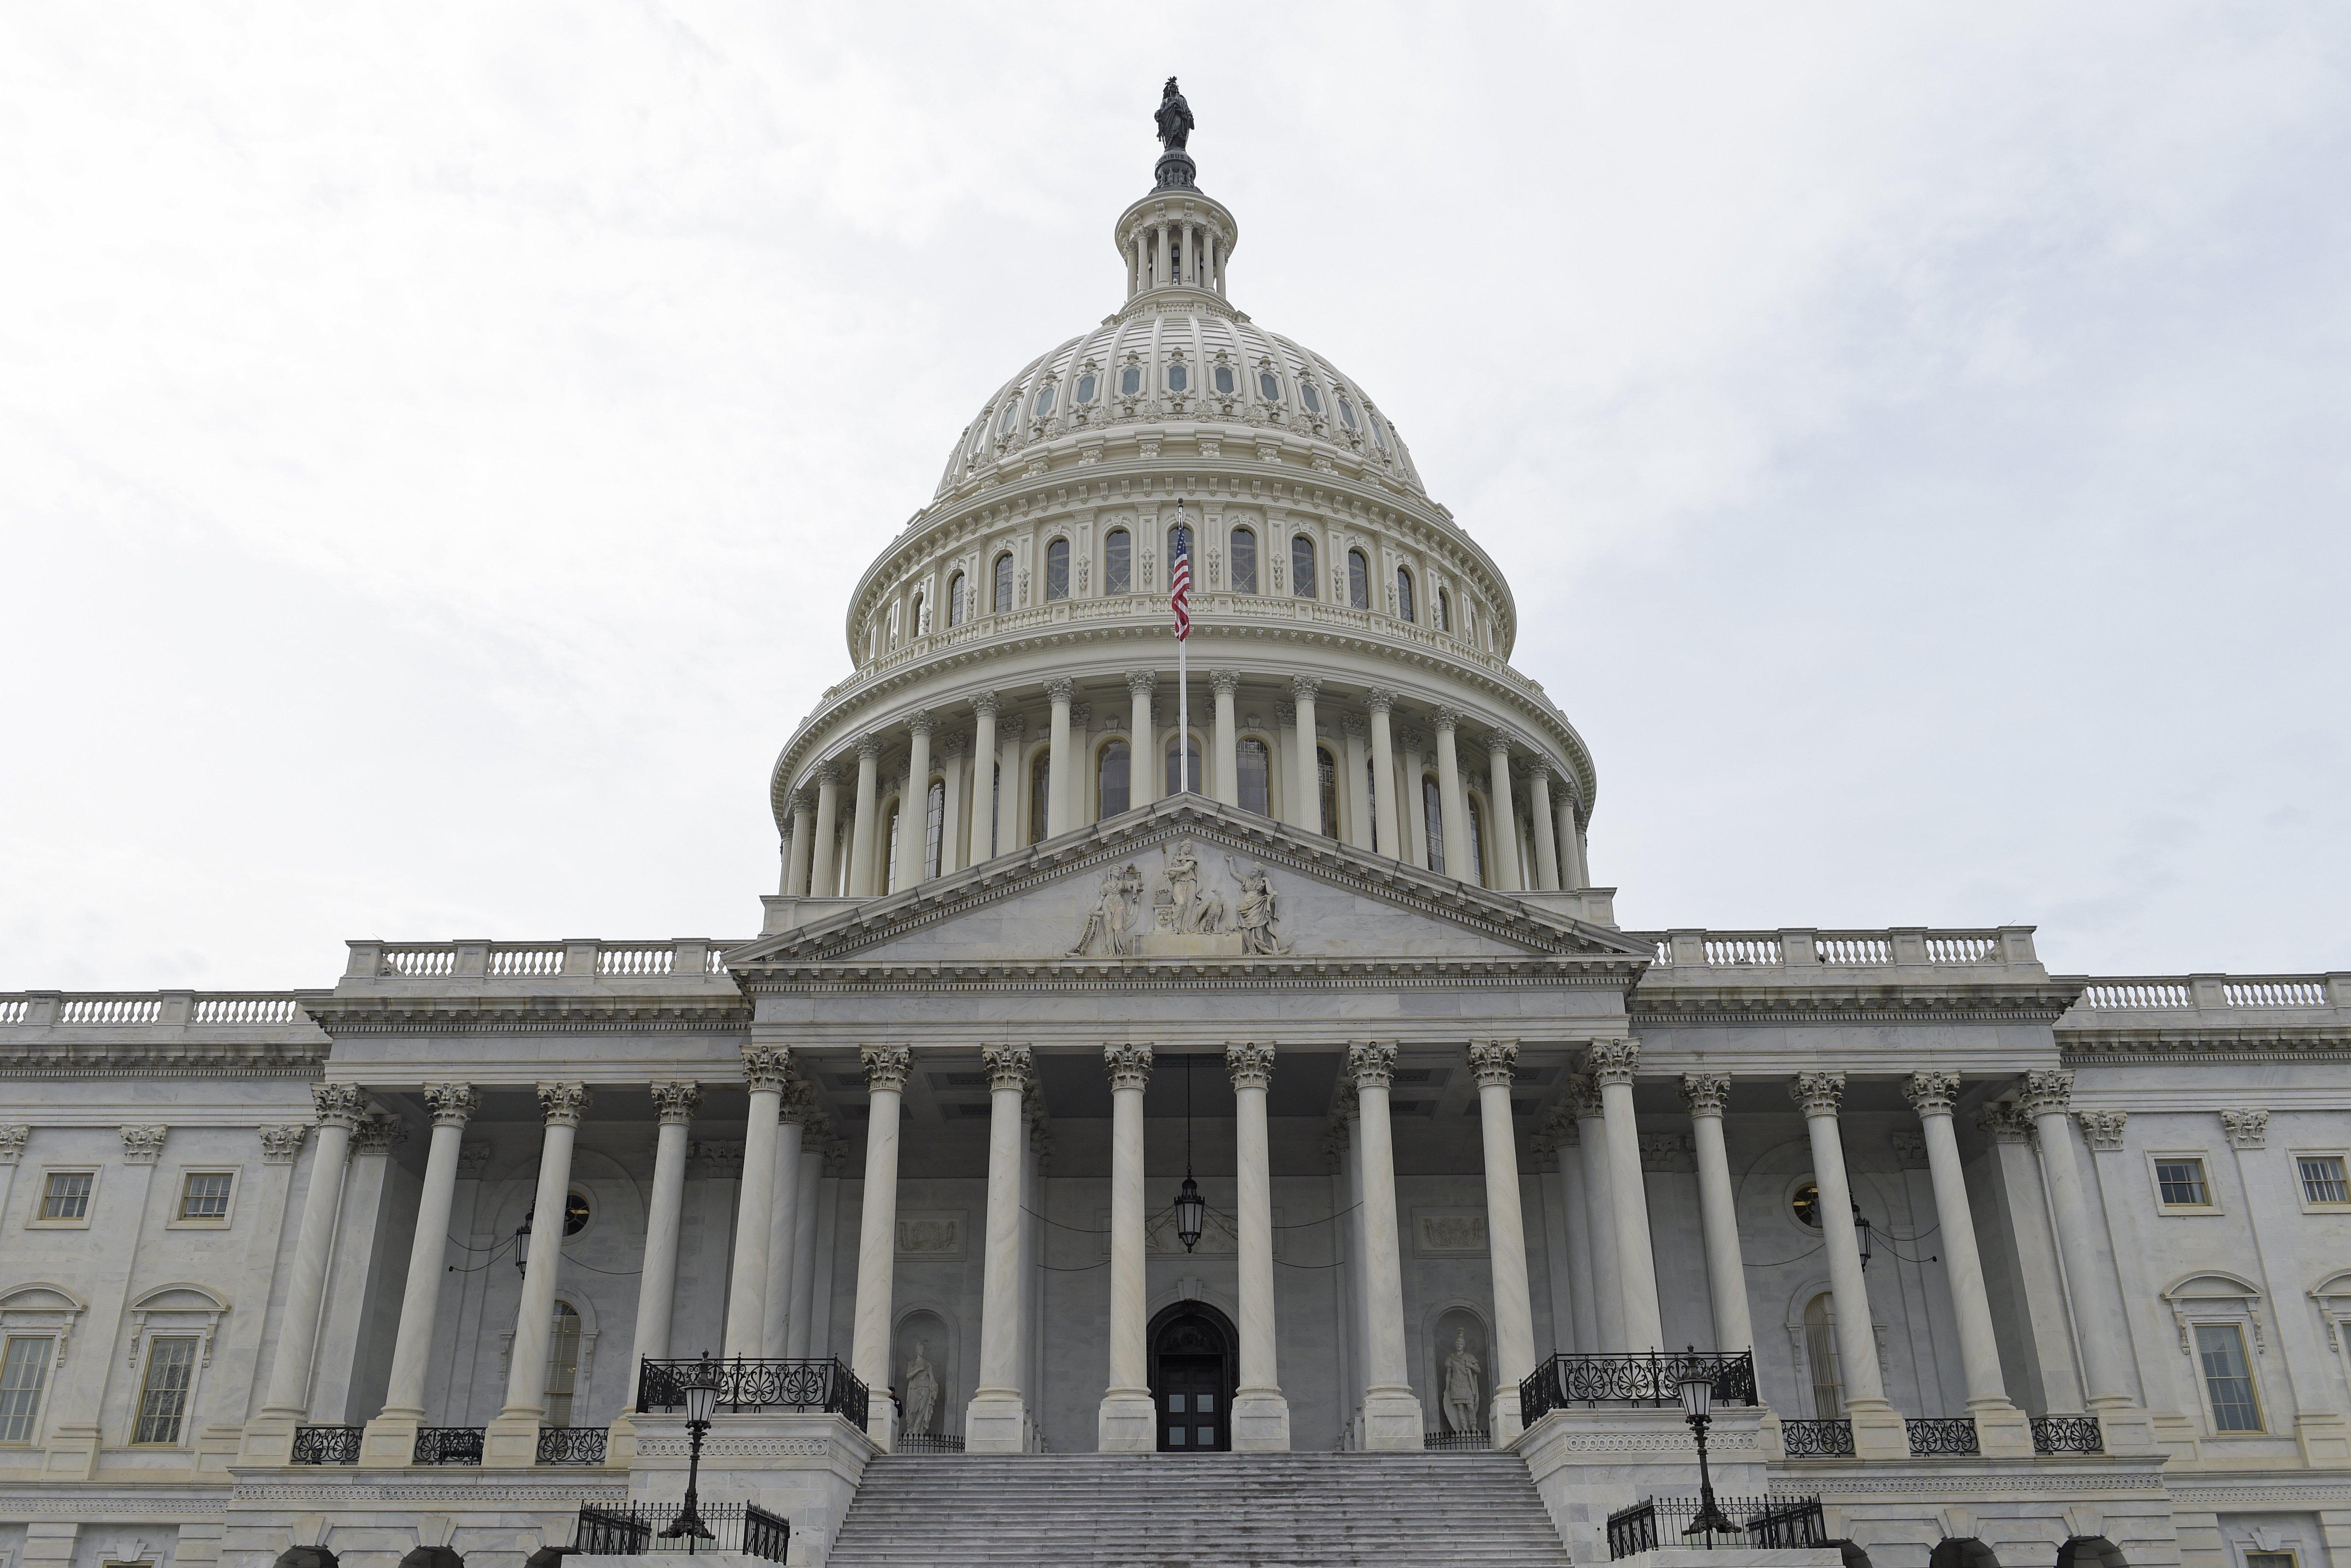 Capitol Hill in Washington, DC, on Feb. 28, 2017.